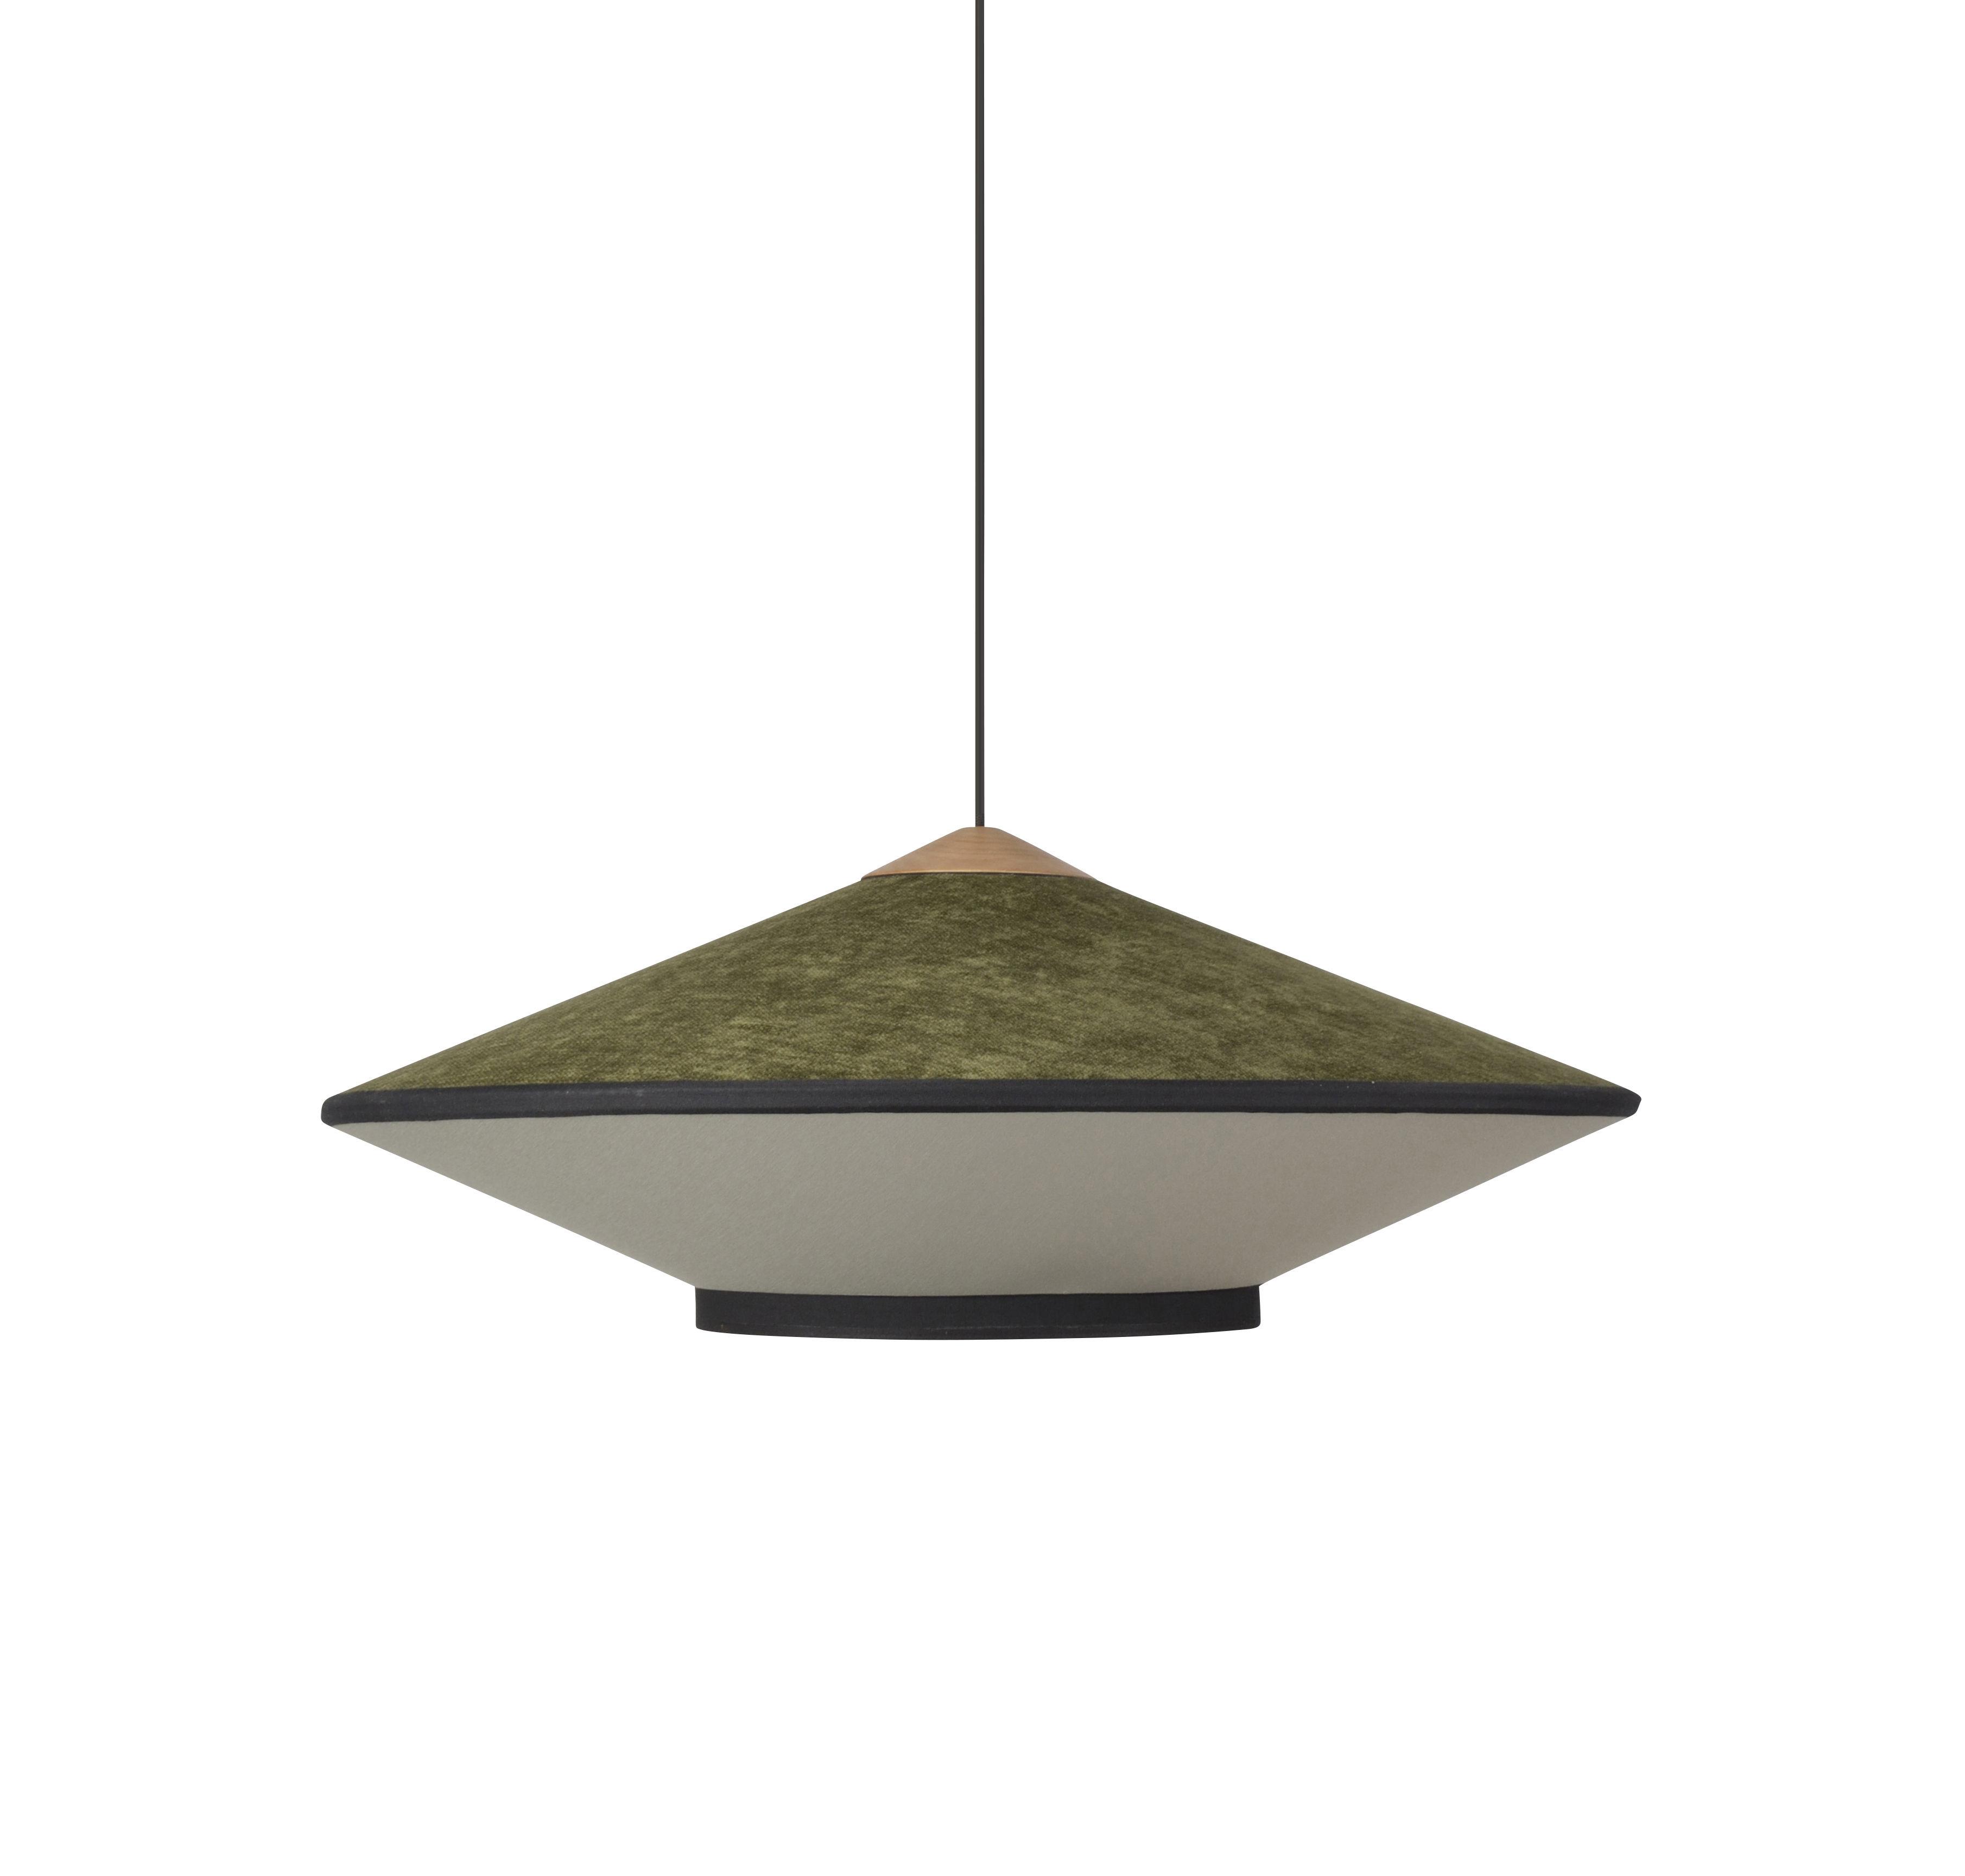 Luminaire - Suspensions - Suspension Cymbal Medium / Ø 70 - Velours - Forestier - Vert - Chêne, Tissu, Velours